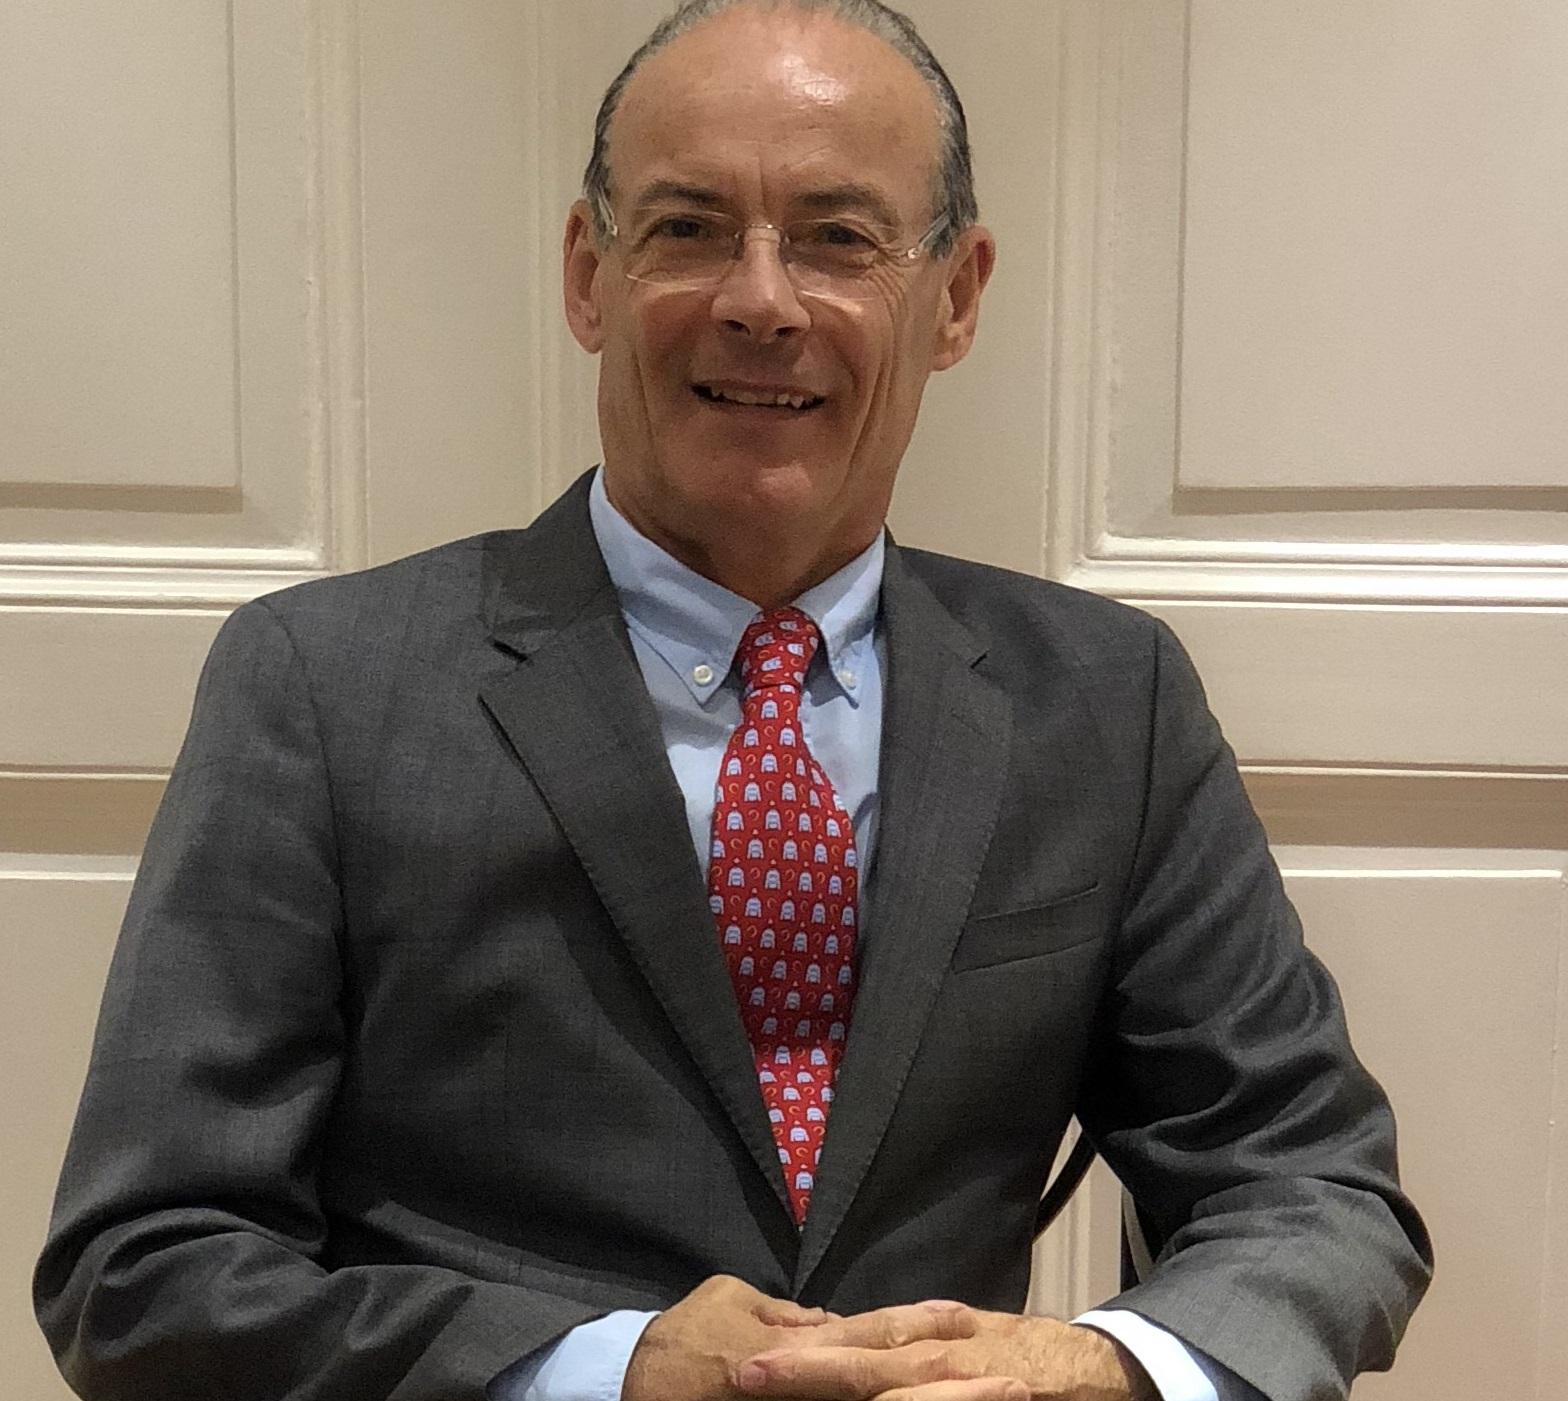 Markus Walter Gräff : Board member of Abalone Gräff